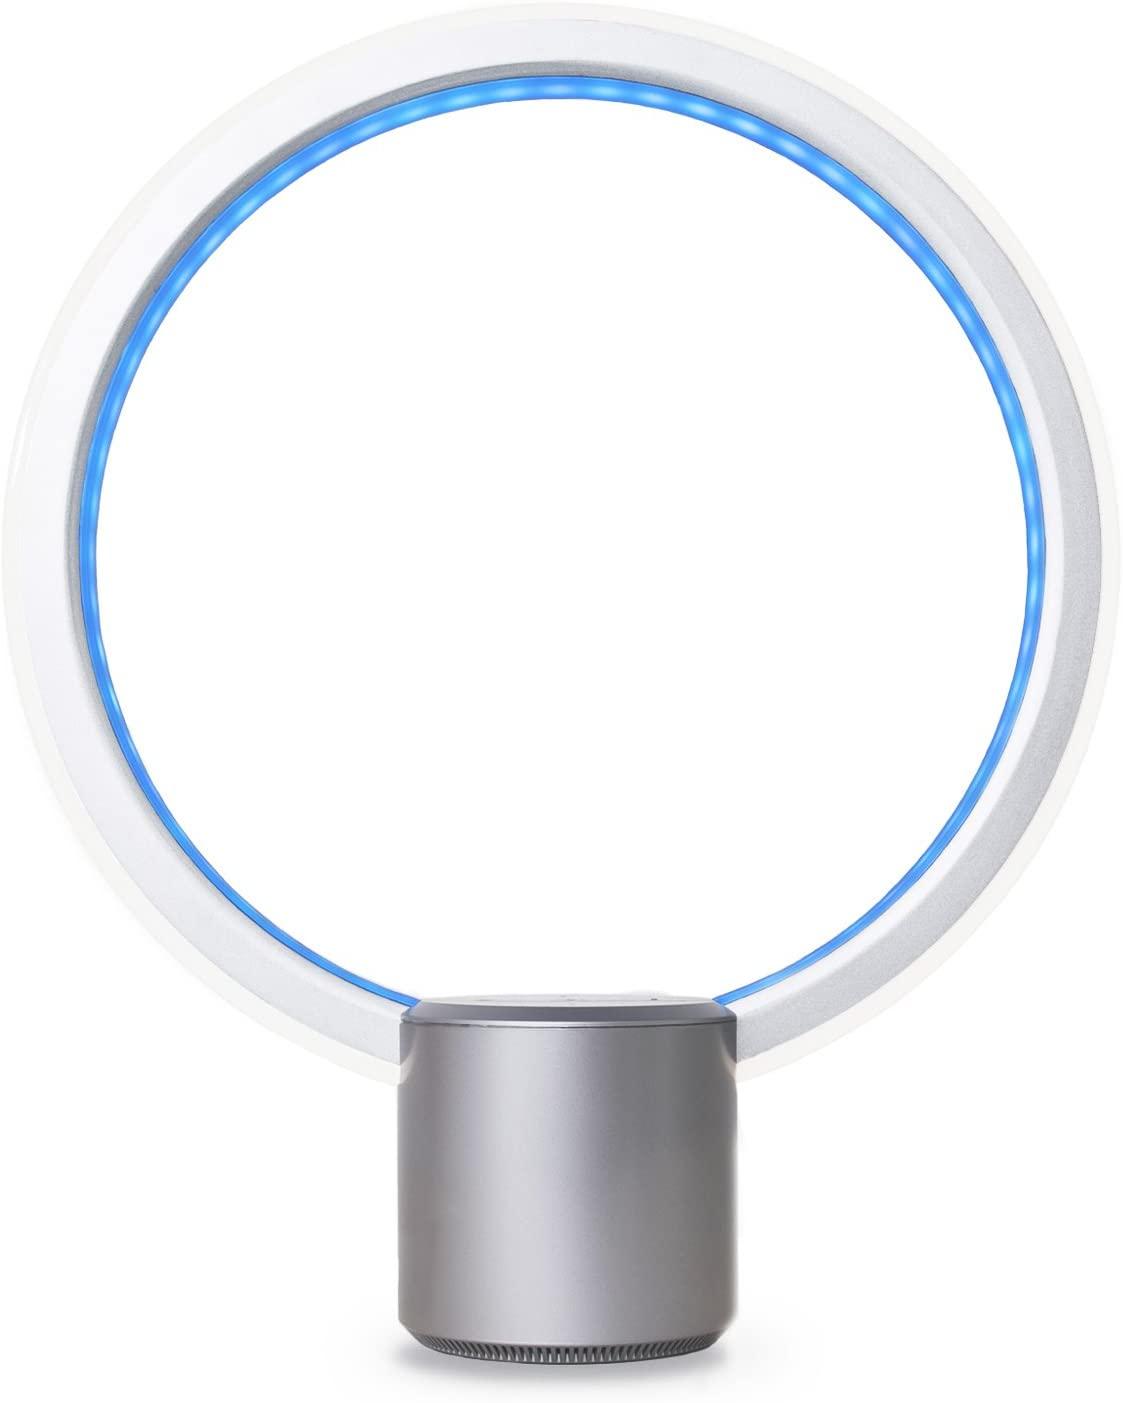 GE Lighting C Smart Lamp